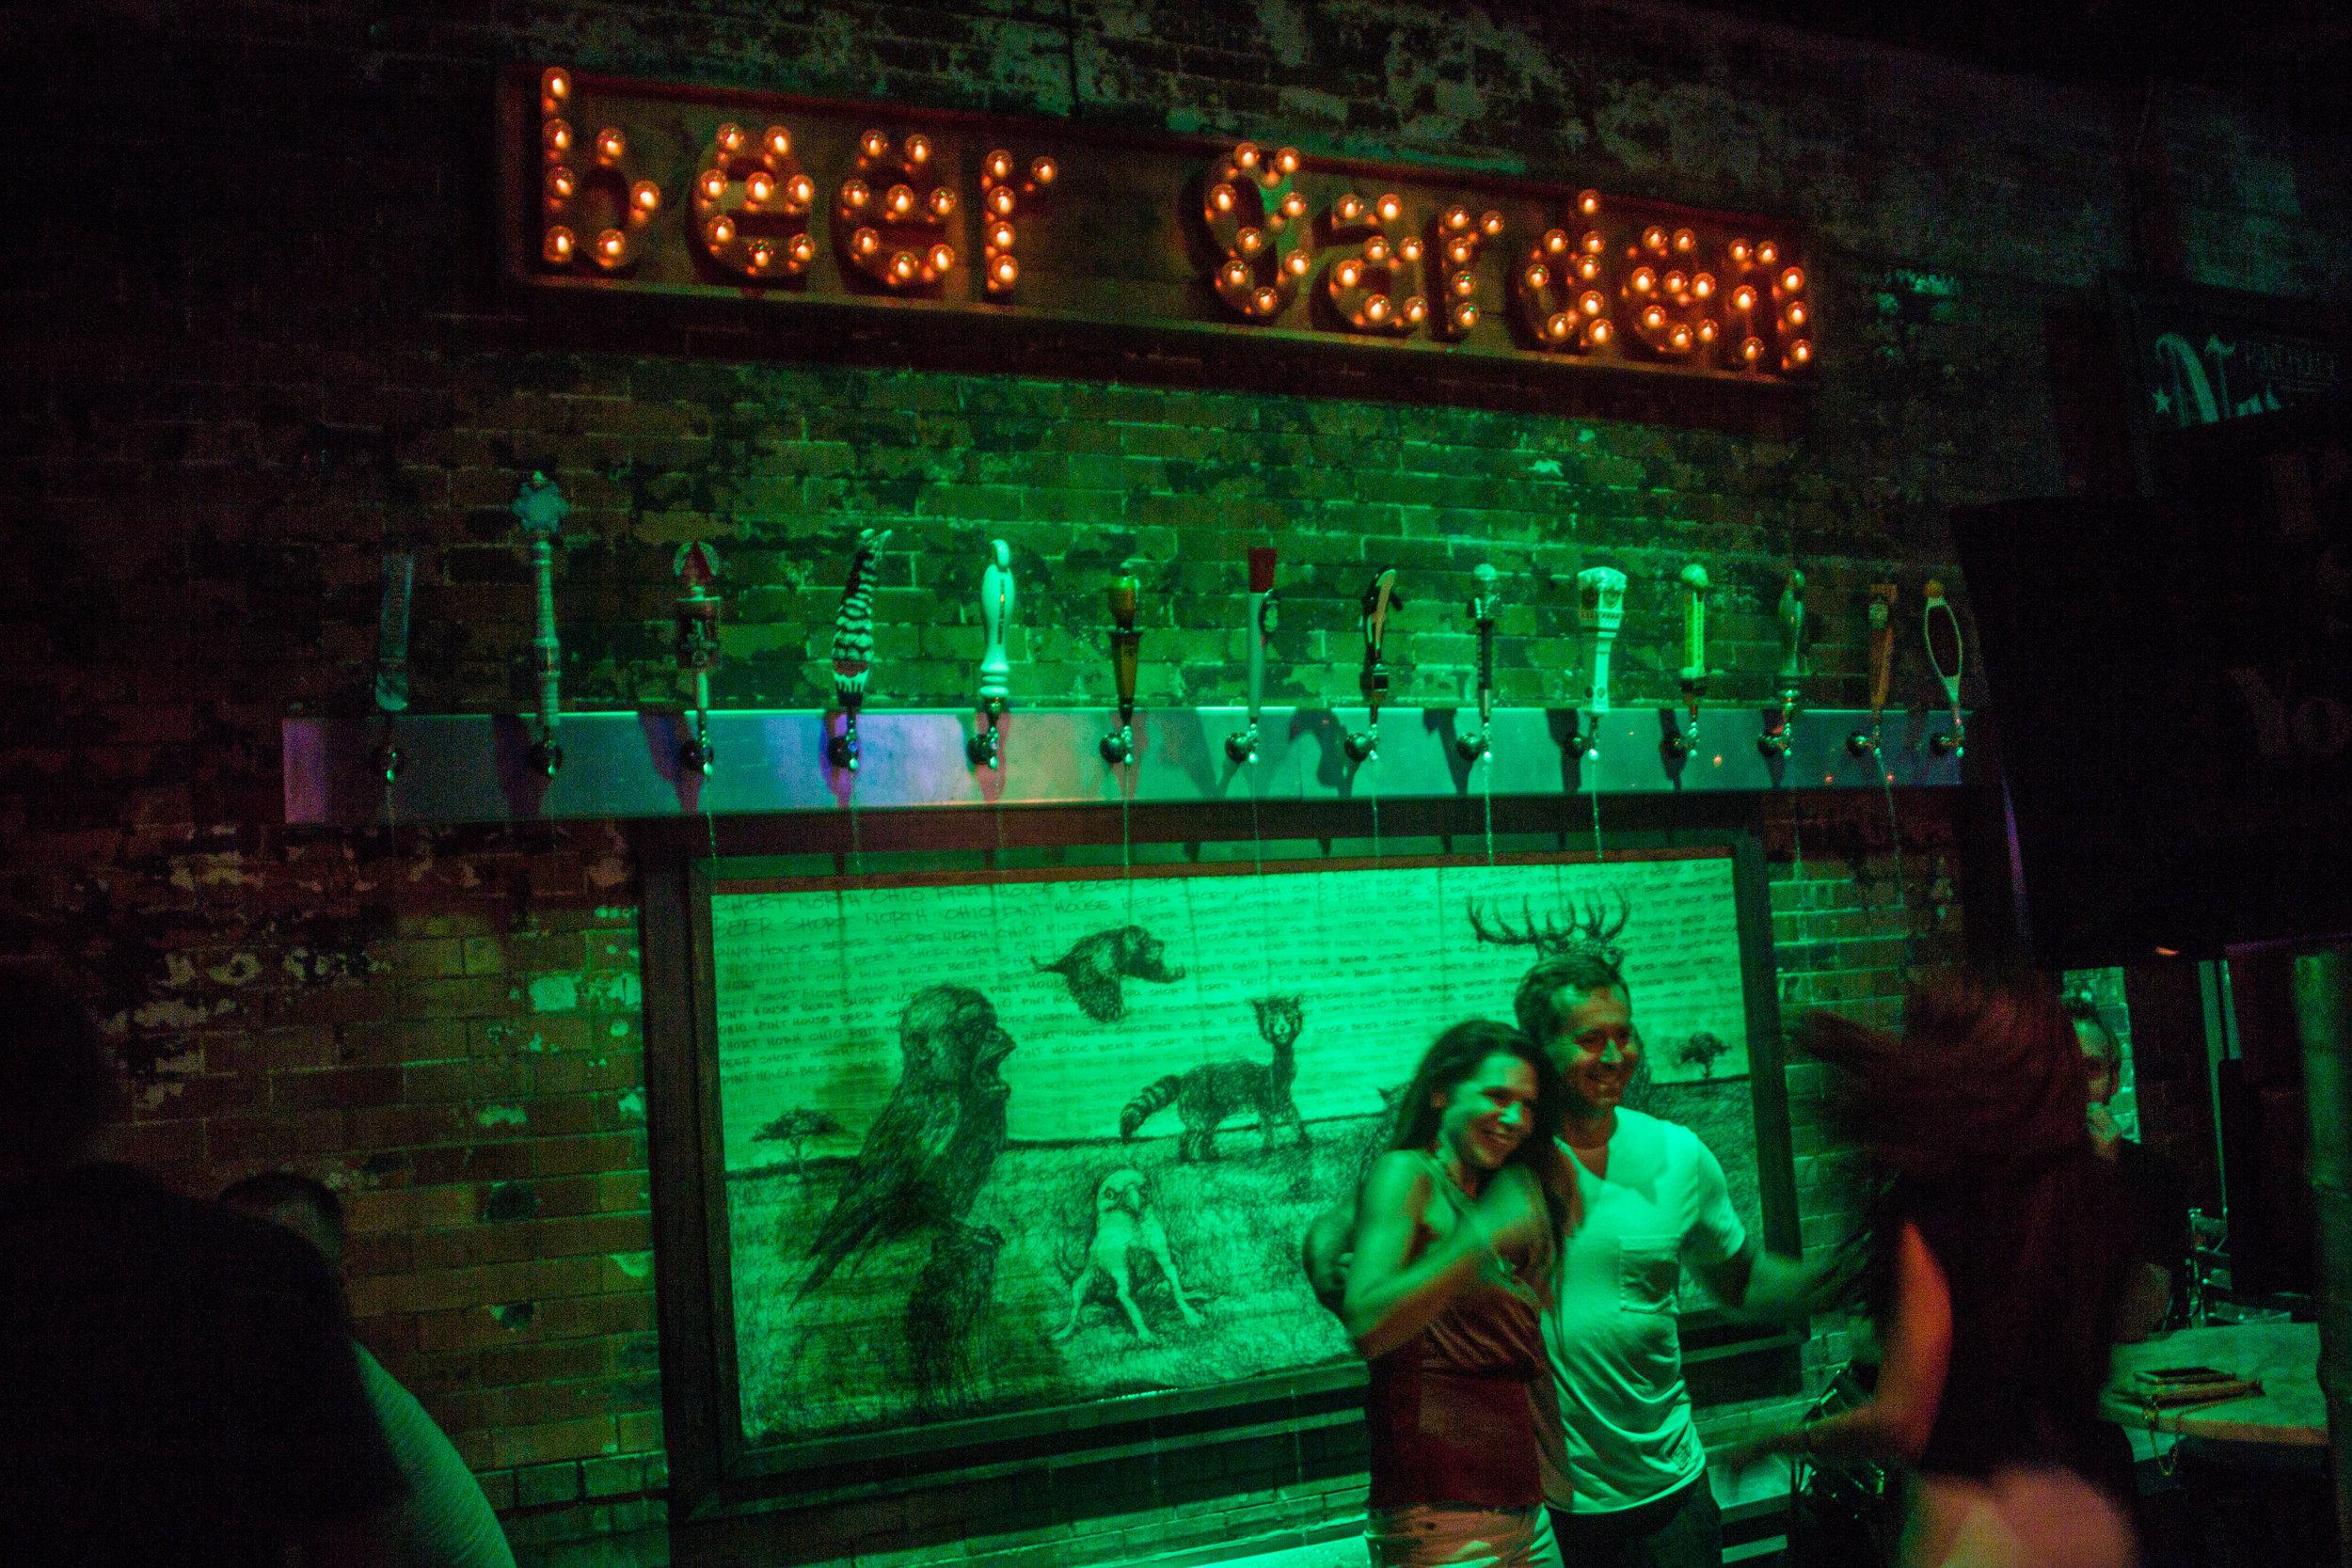 pint-house-columbus-ohio-bars-4-2.jpg